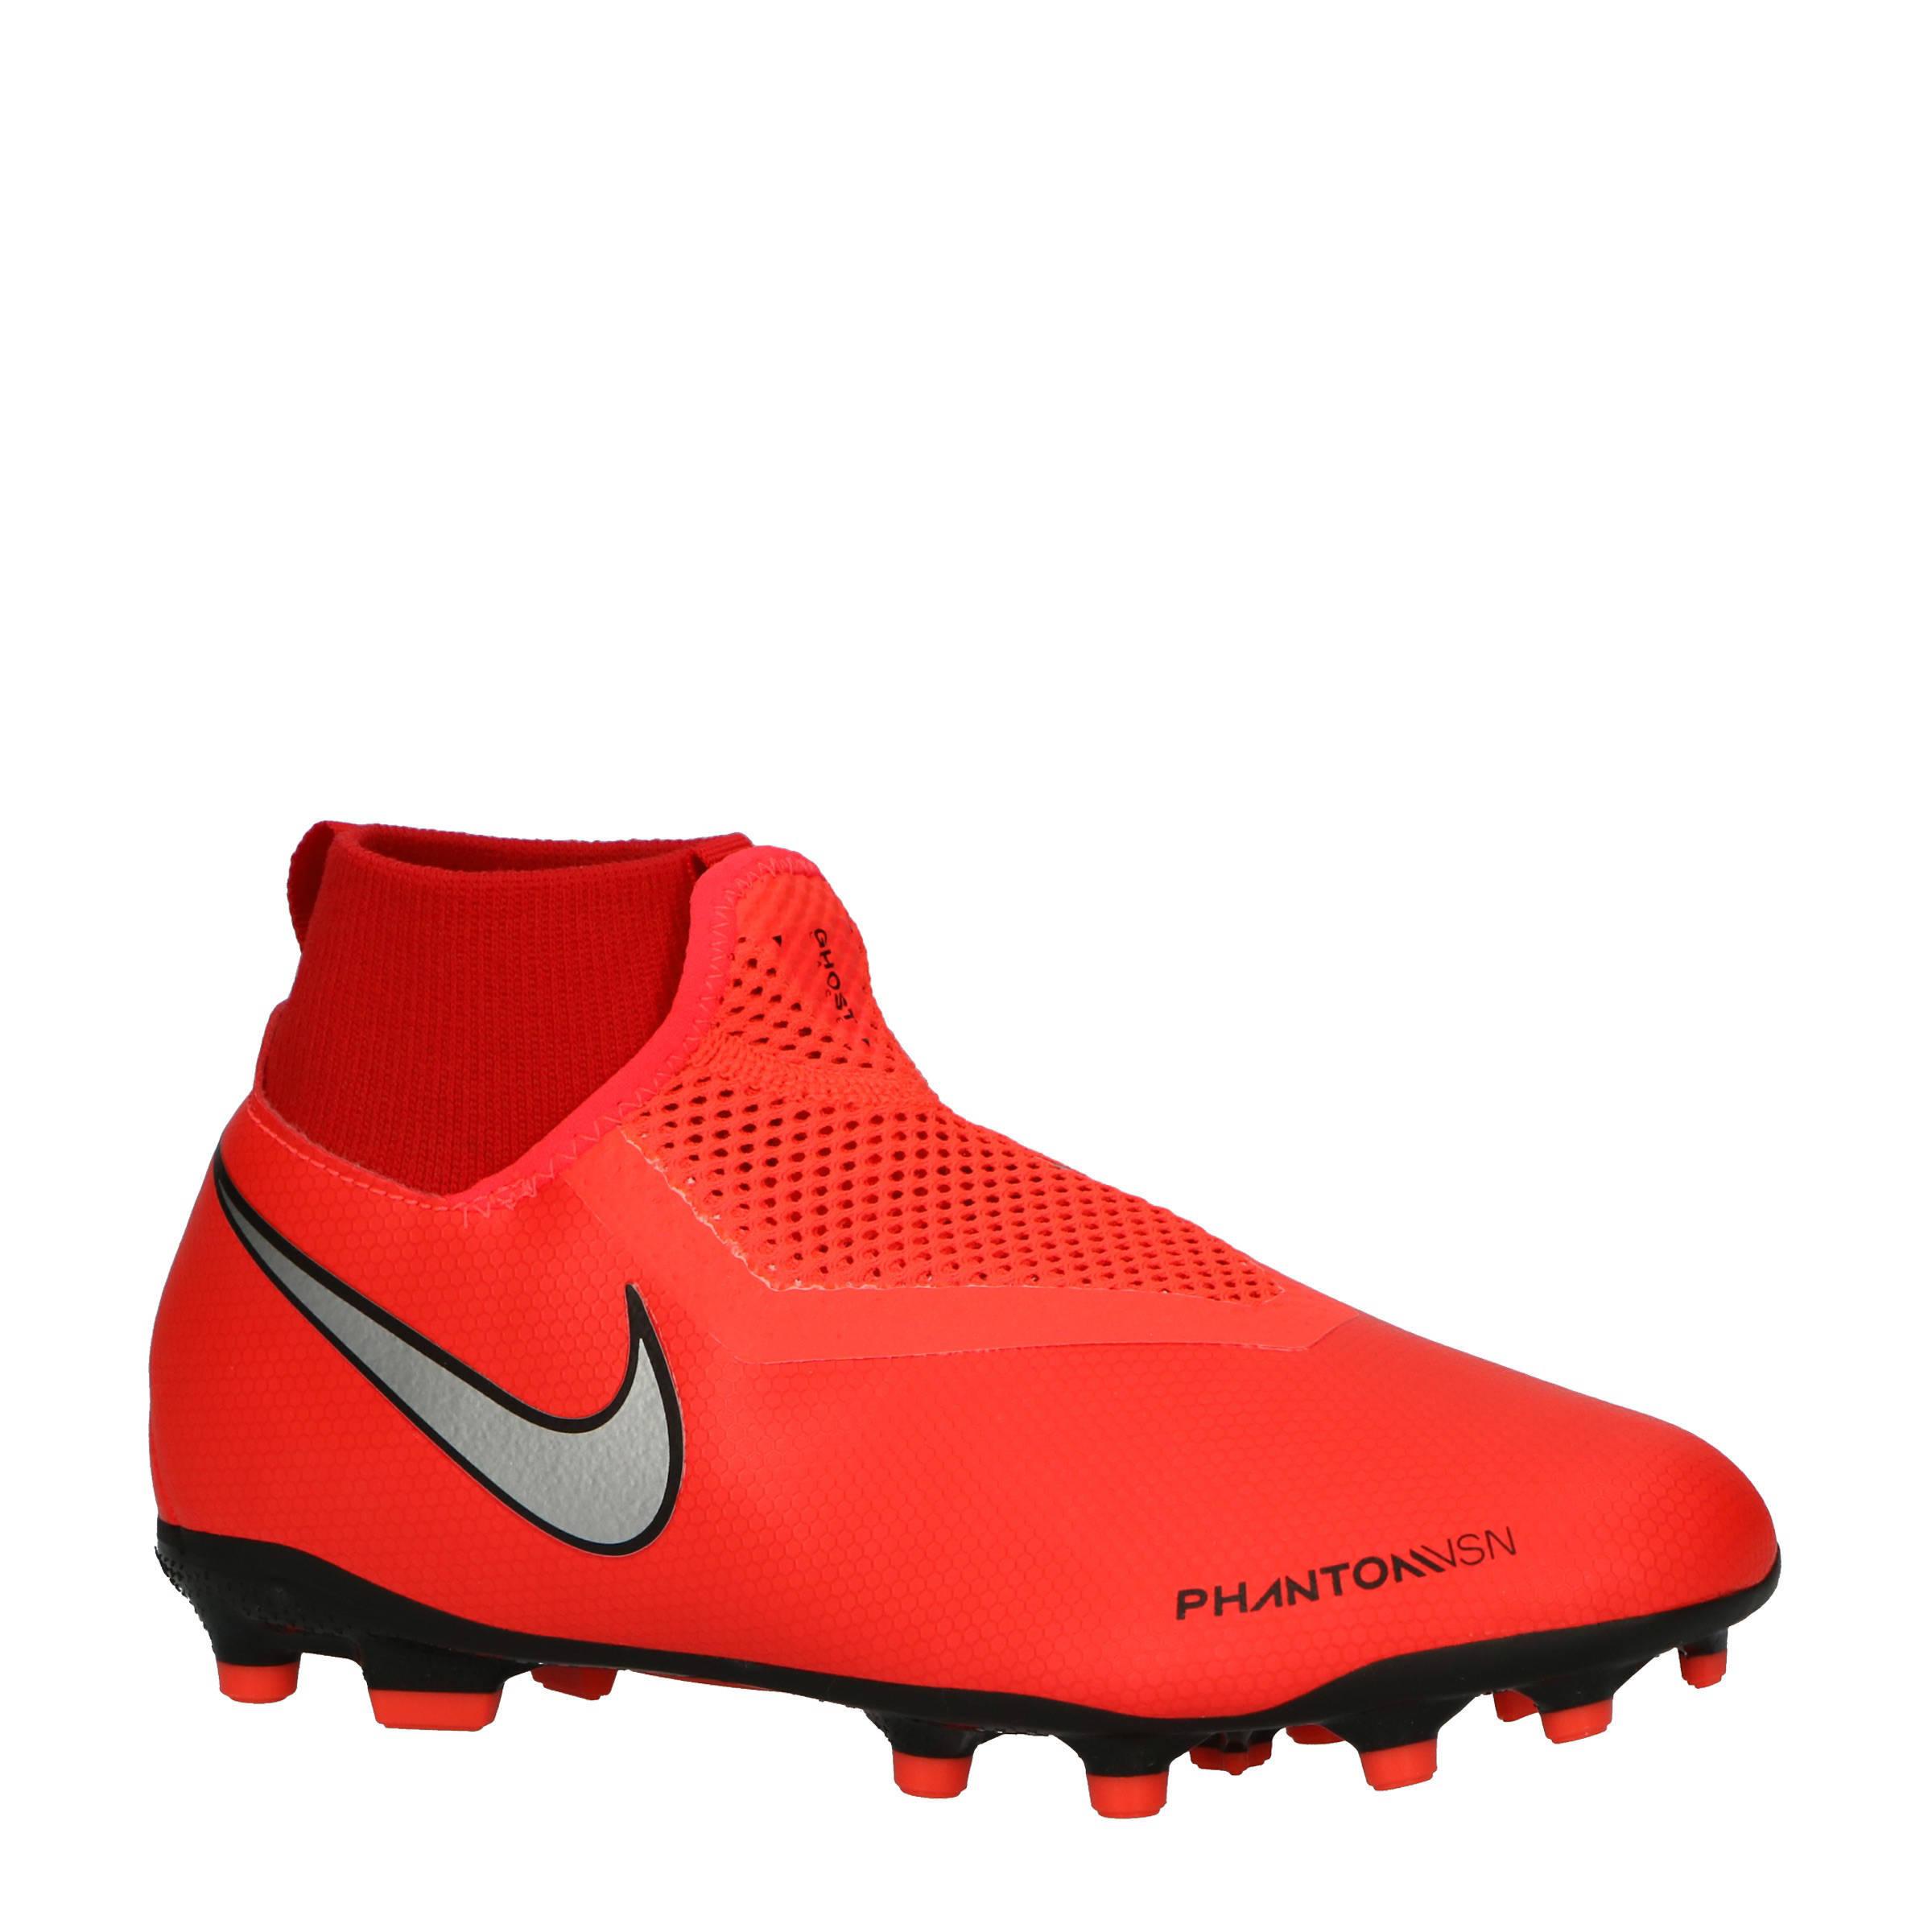 Nike Phantom VSN Academy DF FGMG Jr. voetbalschoenen grijs